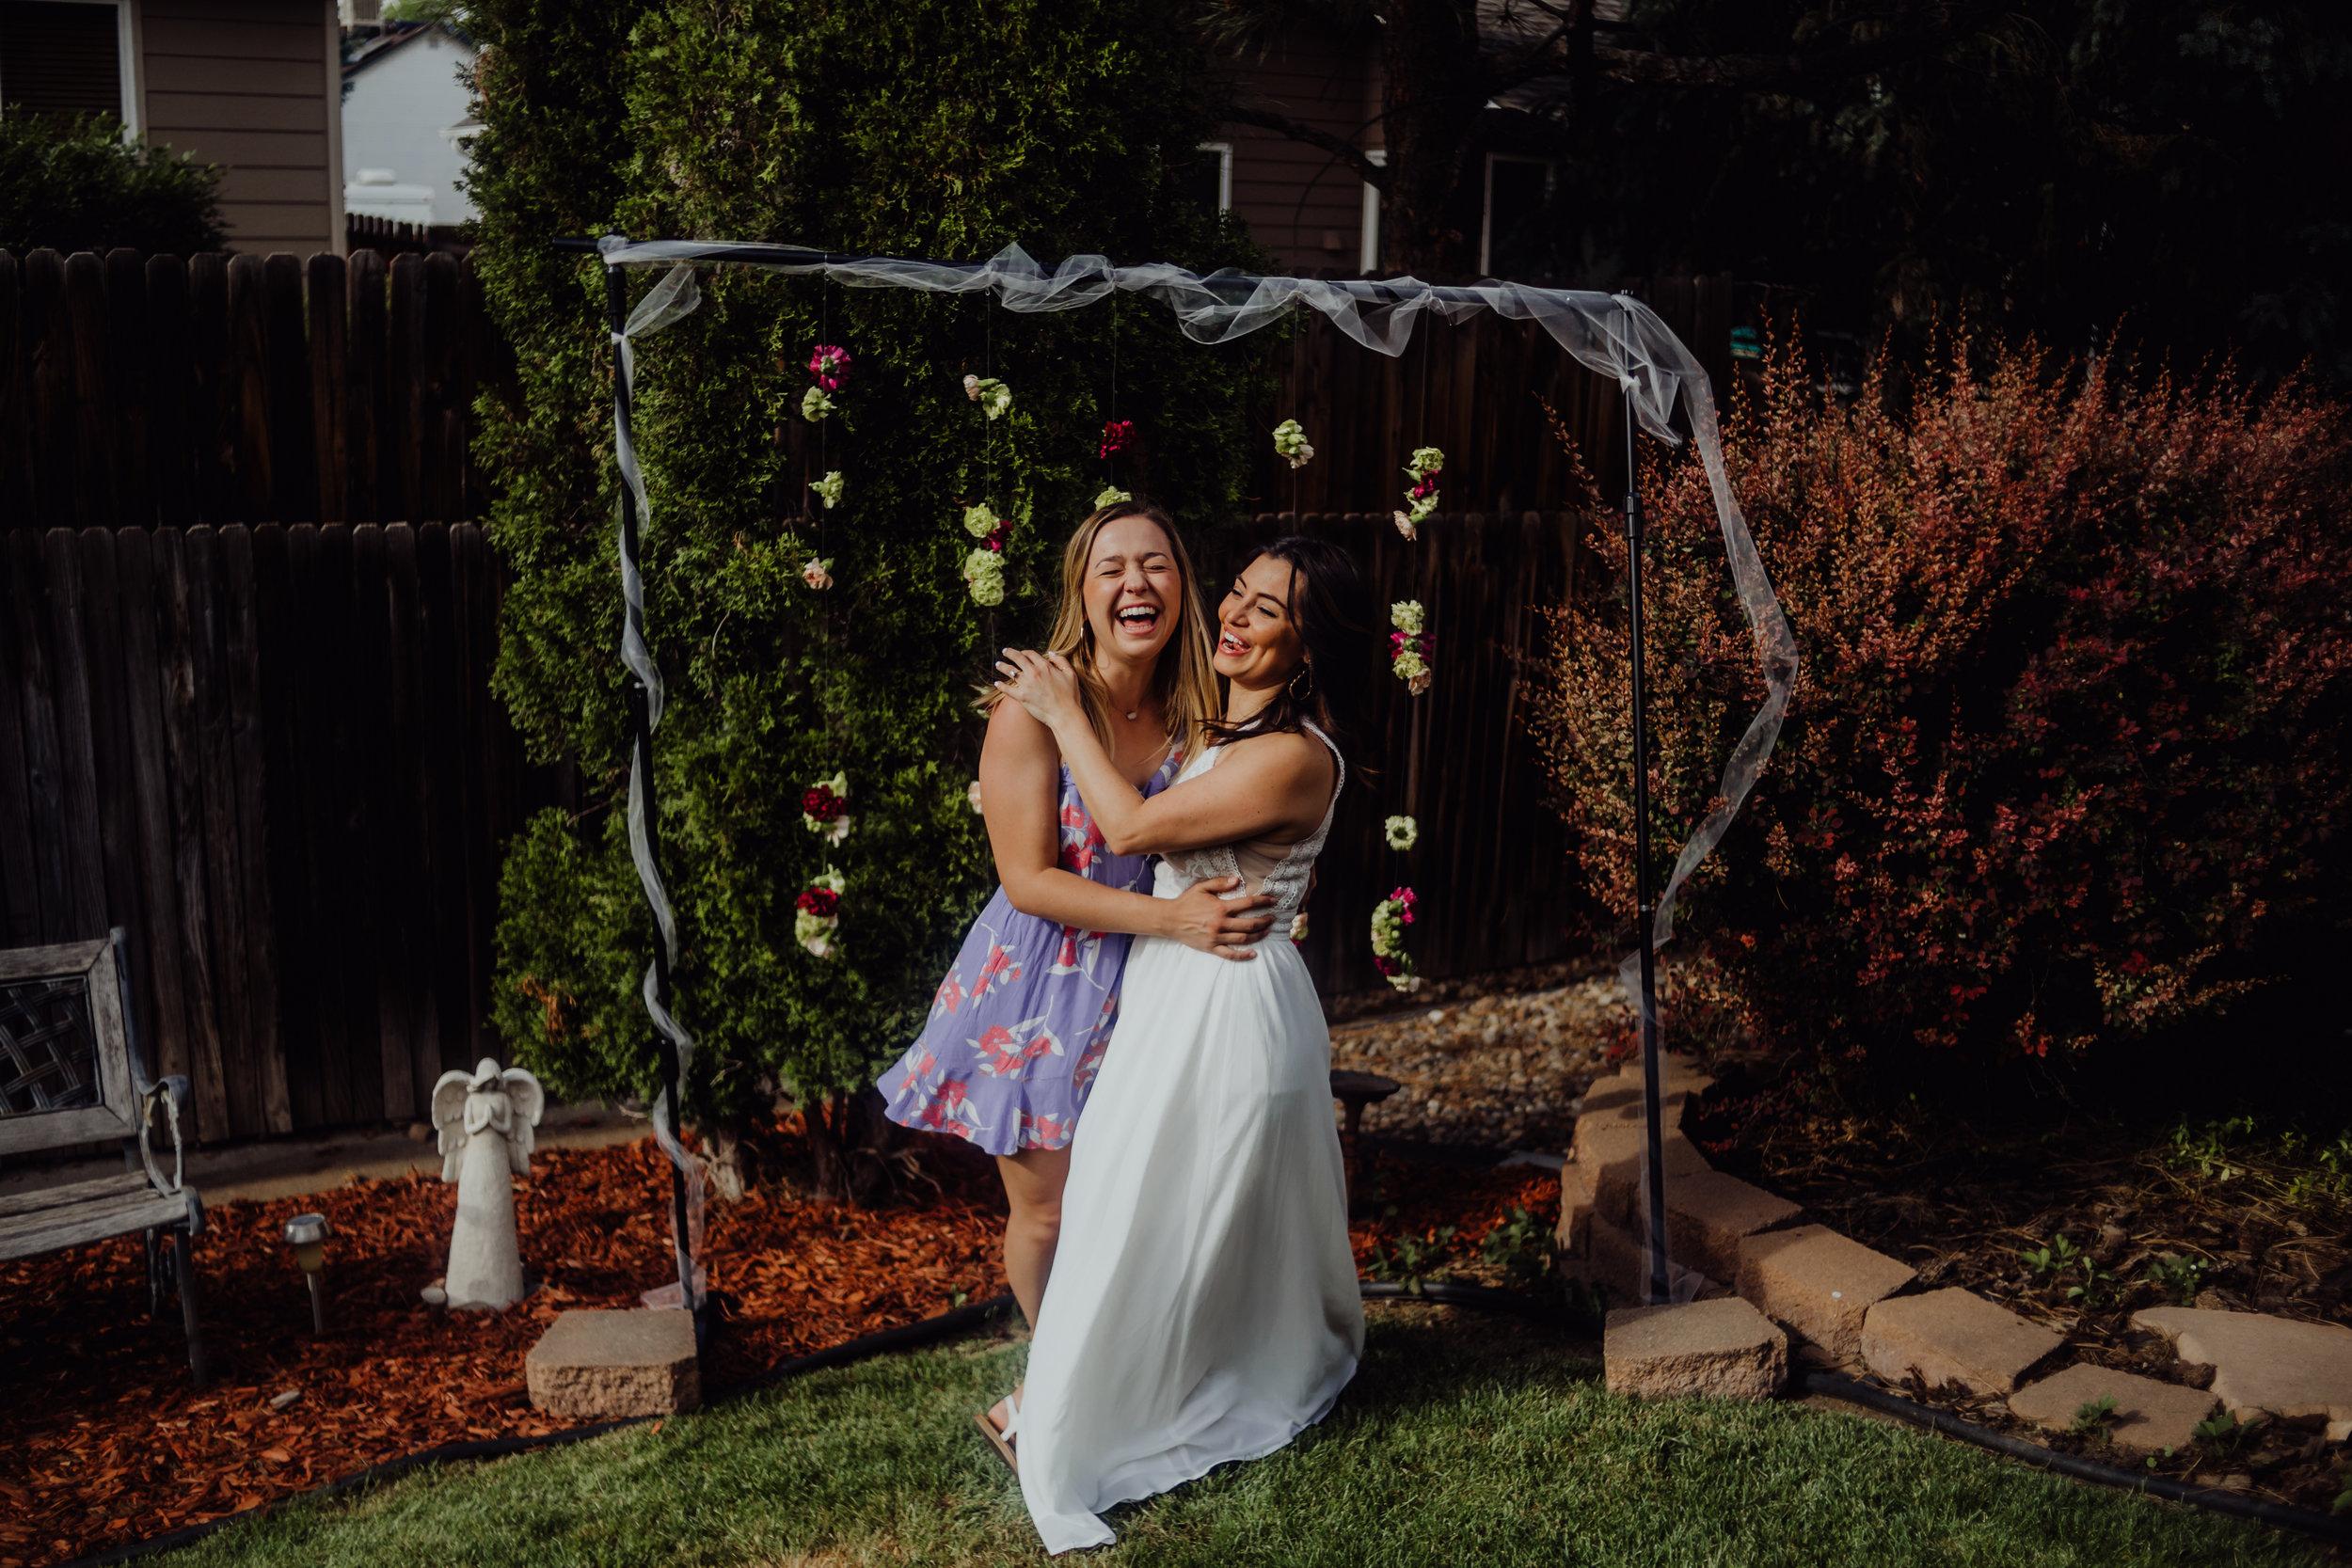 lindsay-arlene-photography-bridal-shower(63of106).jpg